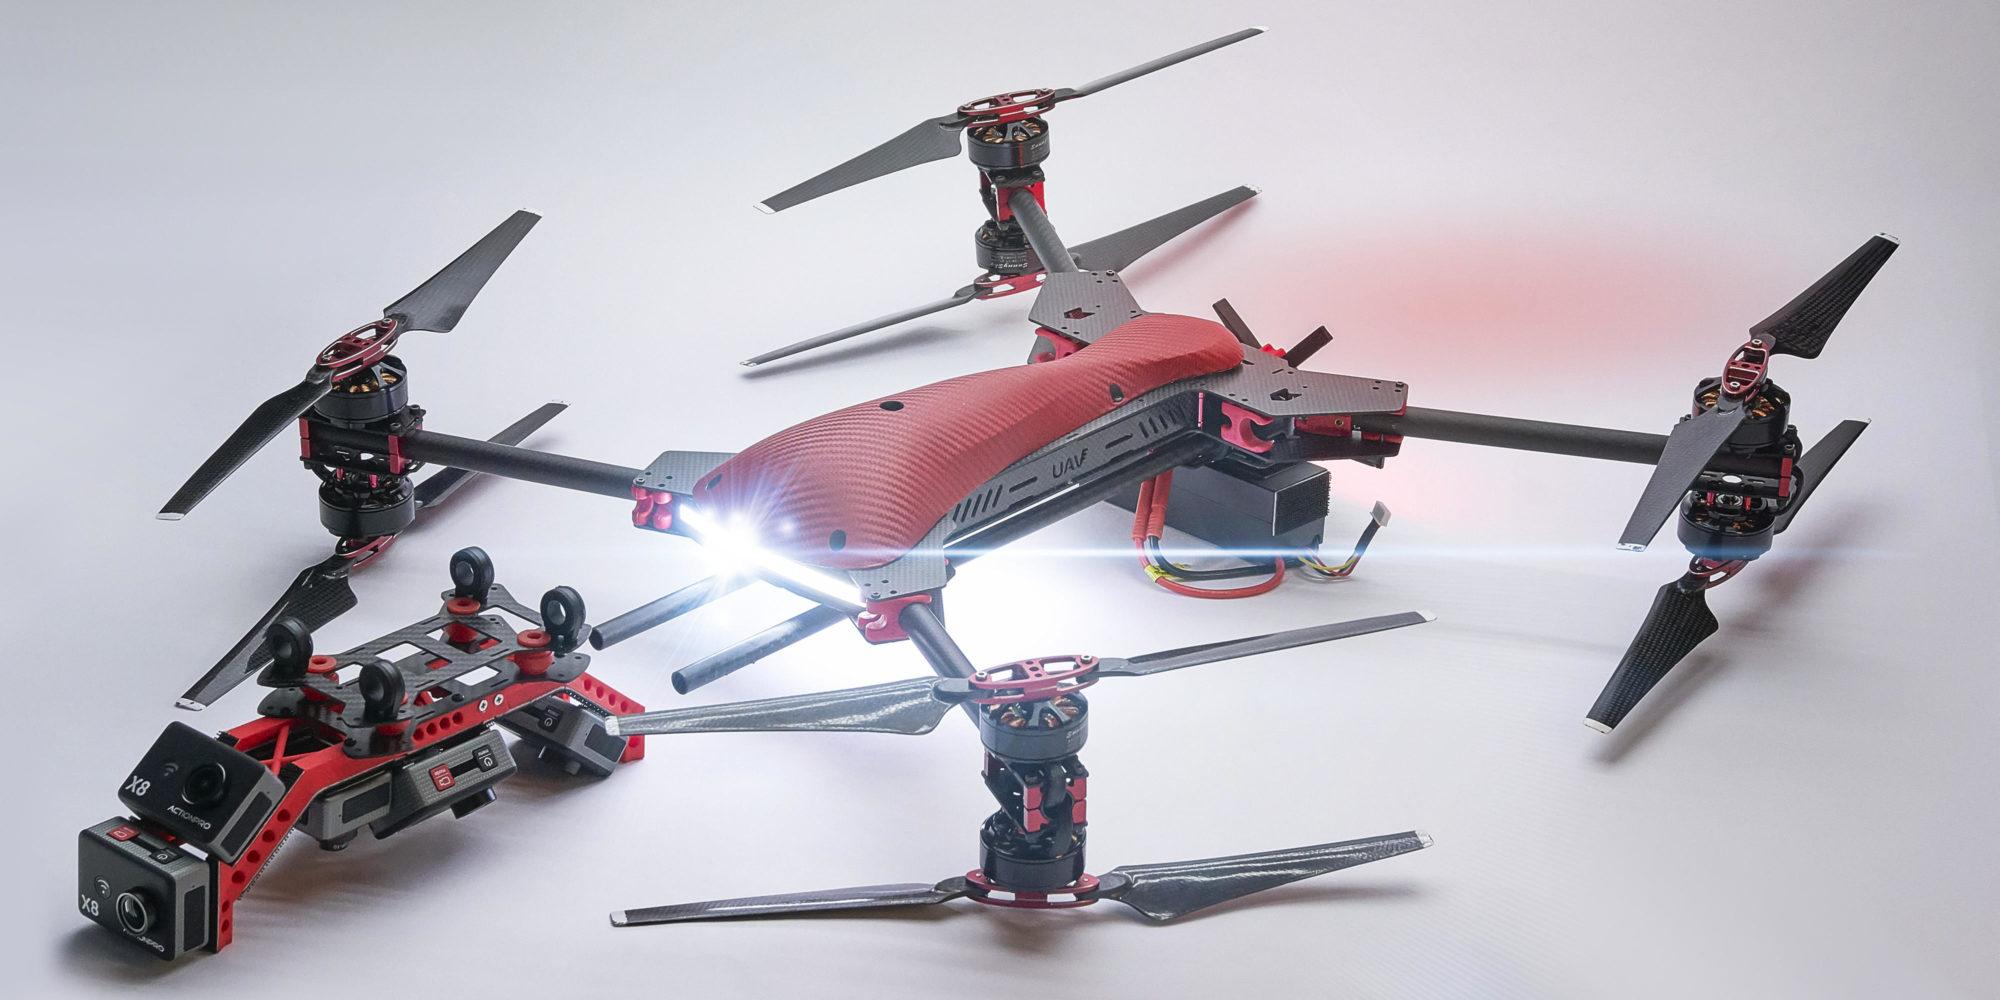 ViraCopter 4x8 RedKite 750 Oktokopter Drohne mit 8x 12 MPixel Kamera Array